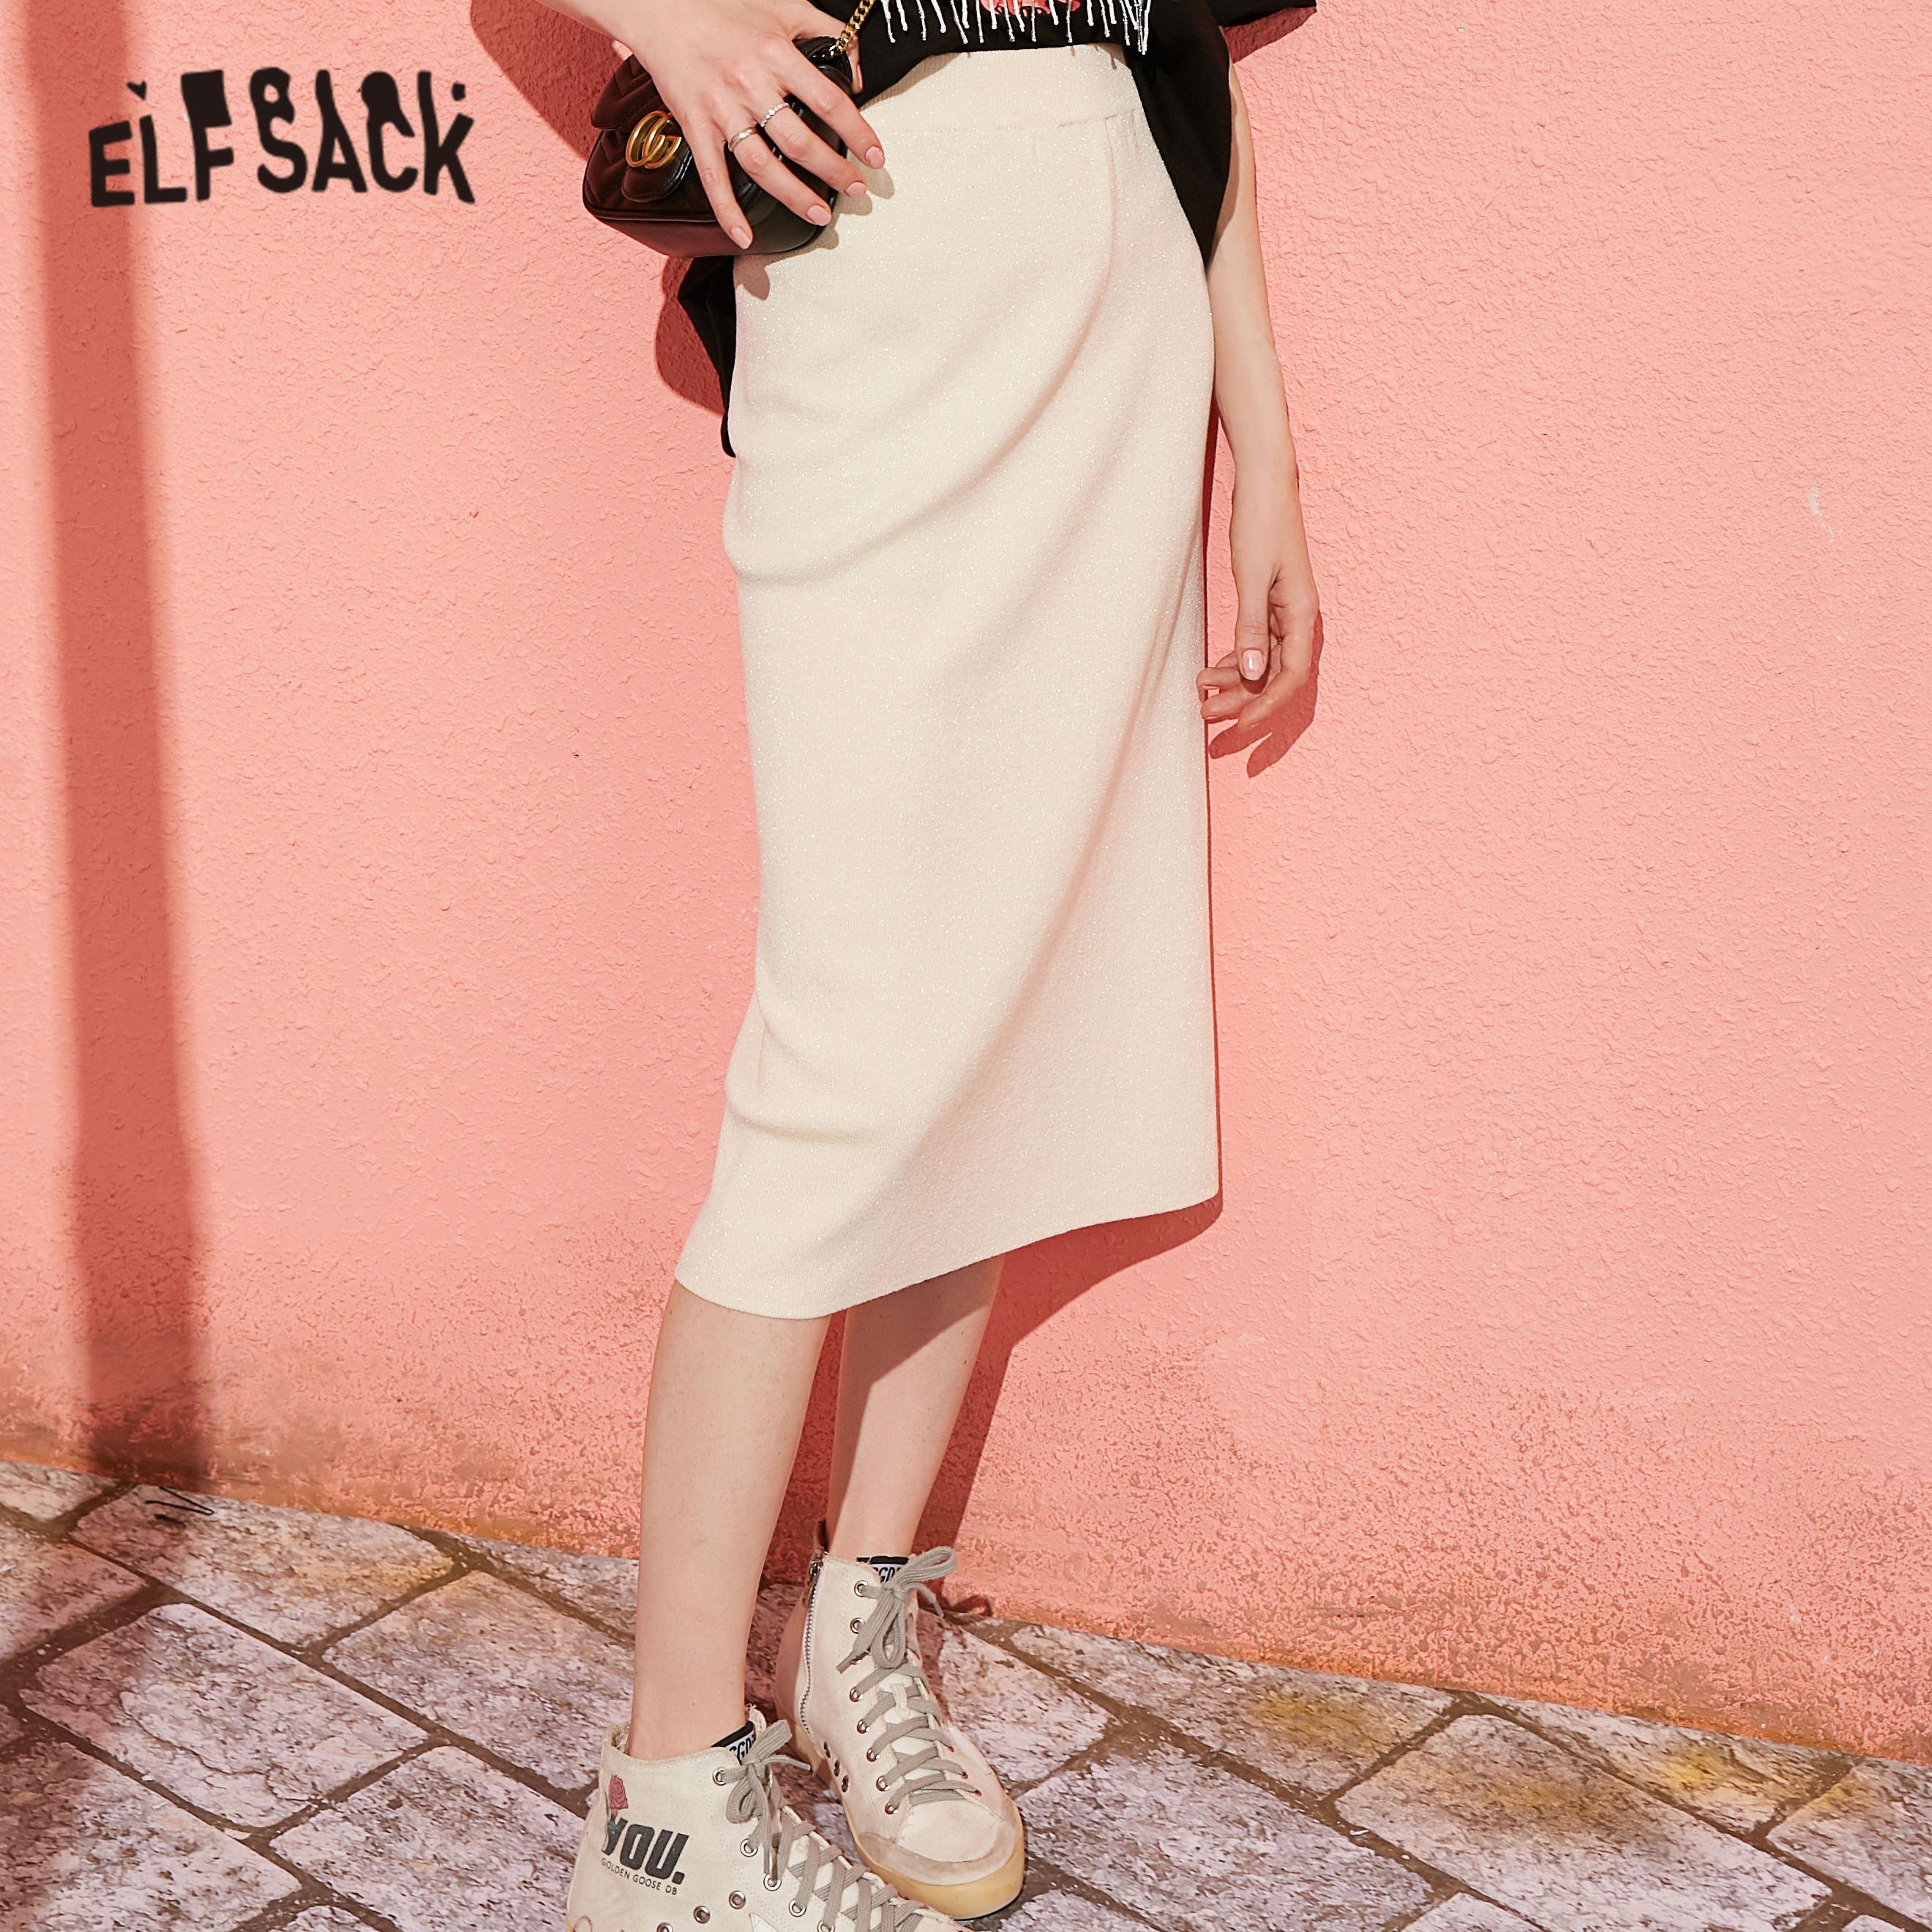 ELFSACK Black Solid Sequins Knit Casual Women Skirts 2020 Spring Pure Back Split High Elastic Waist Ladies Korean Daily Bottoms